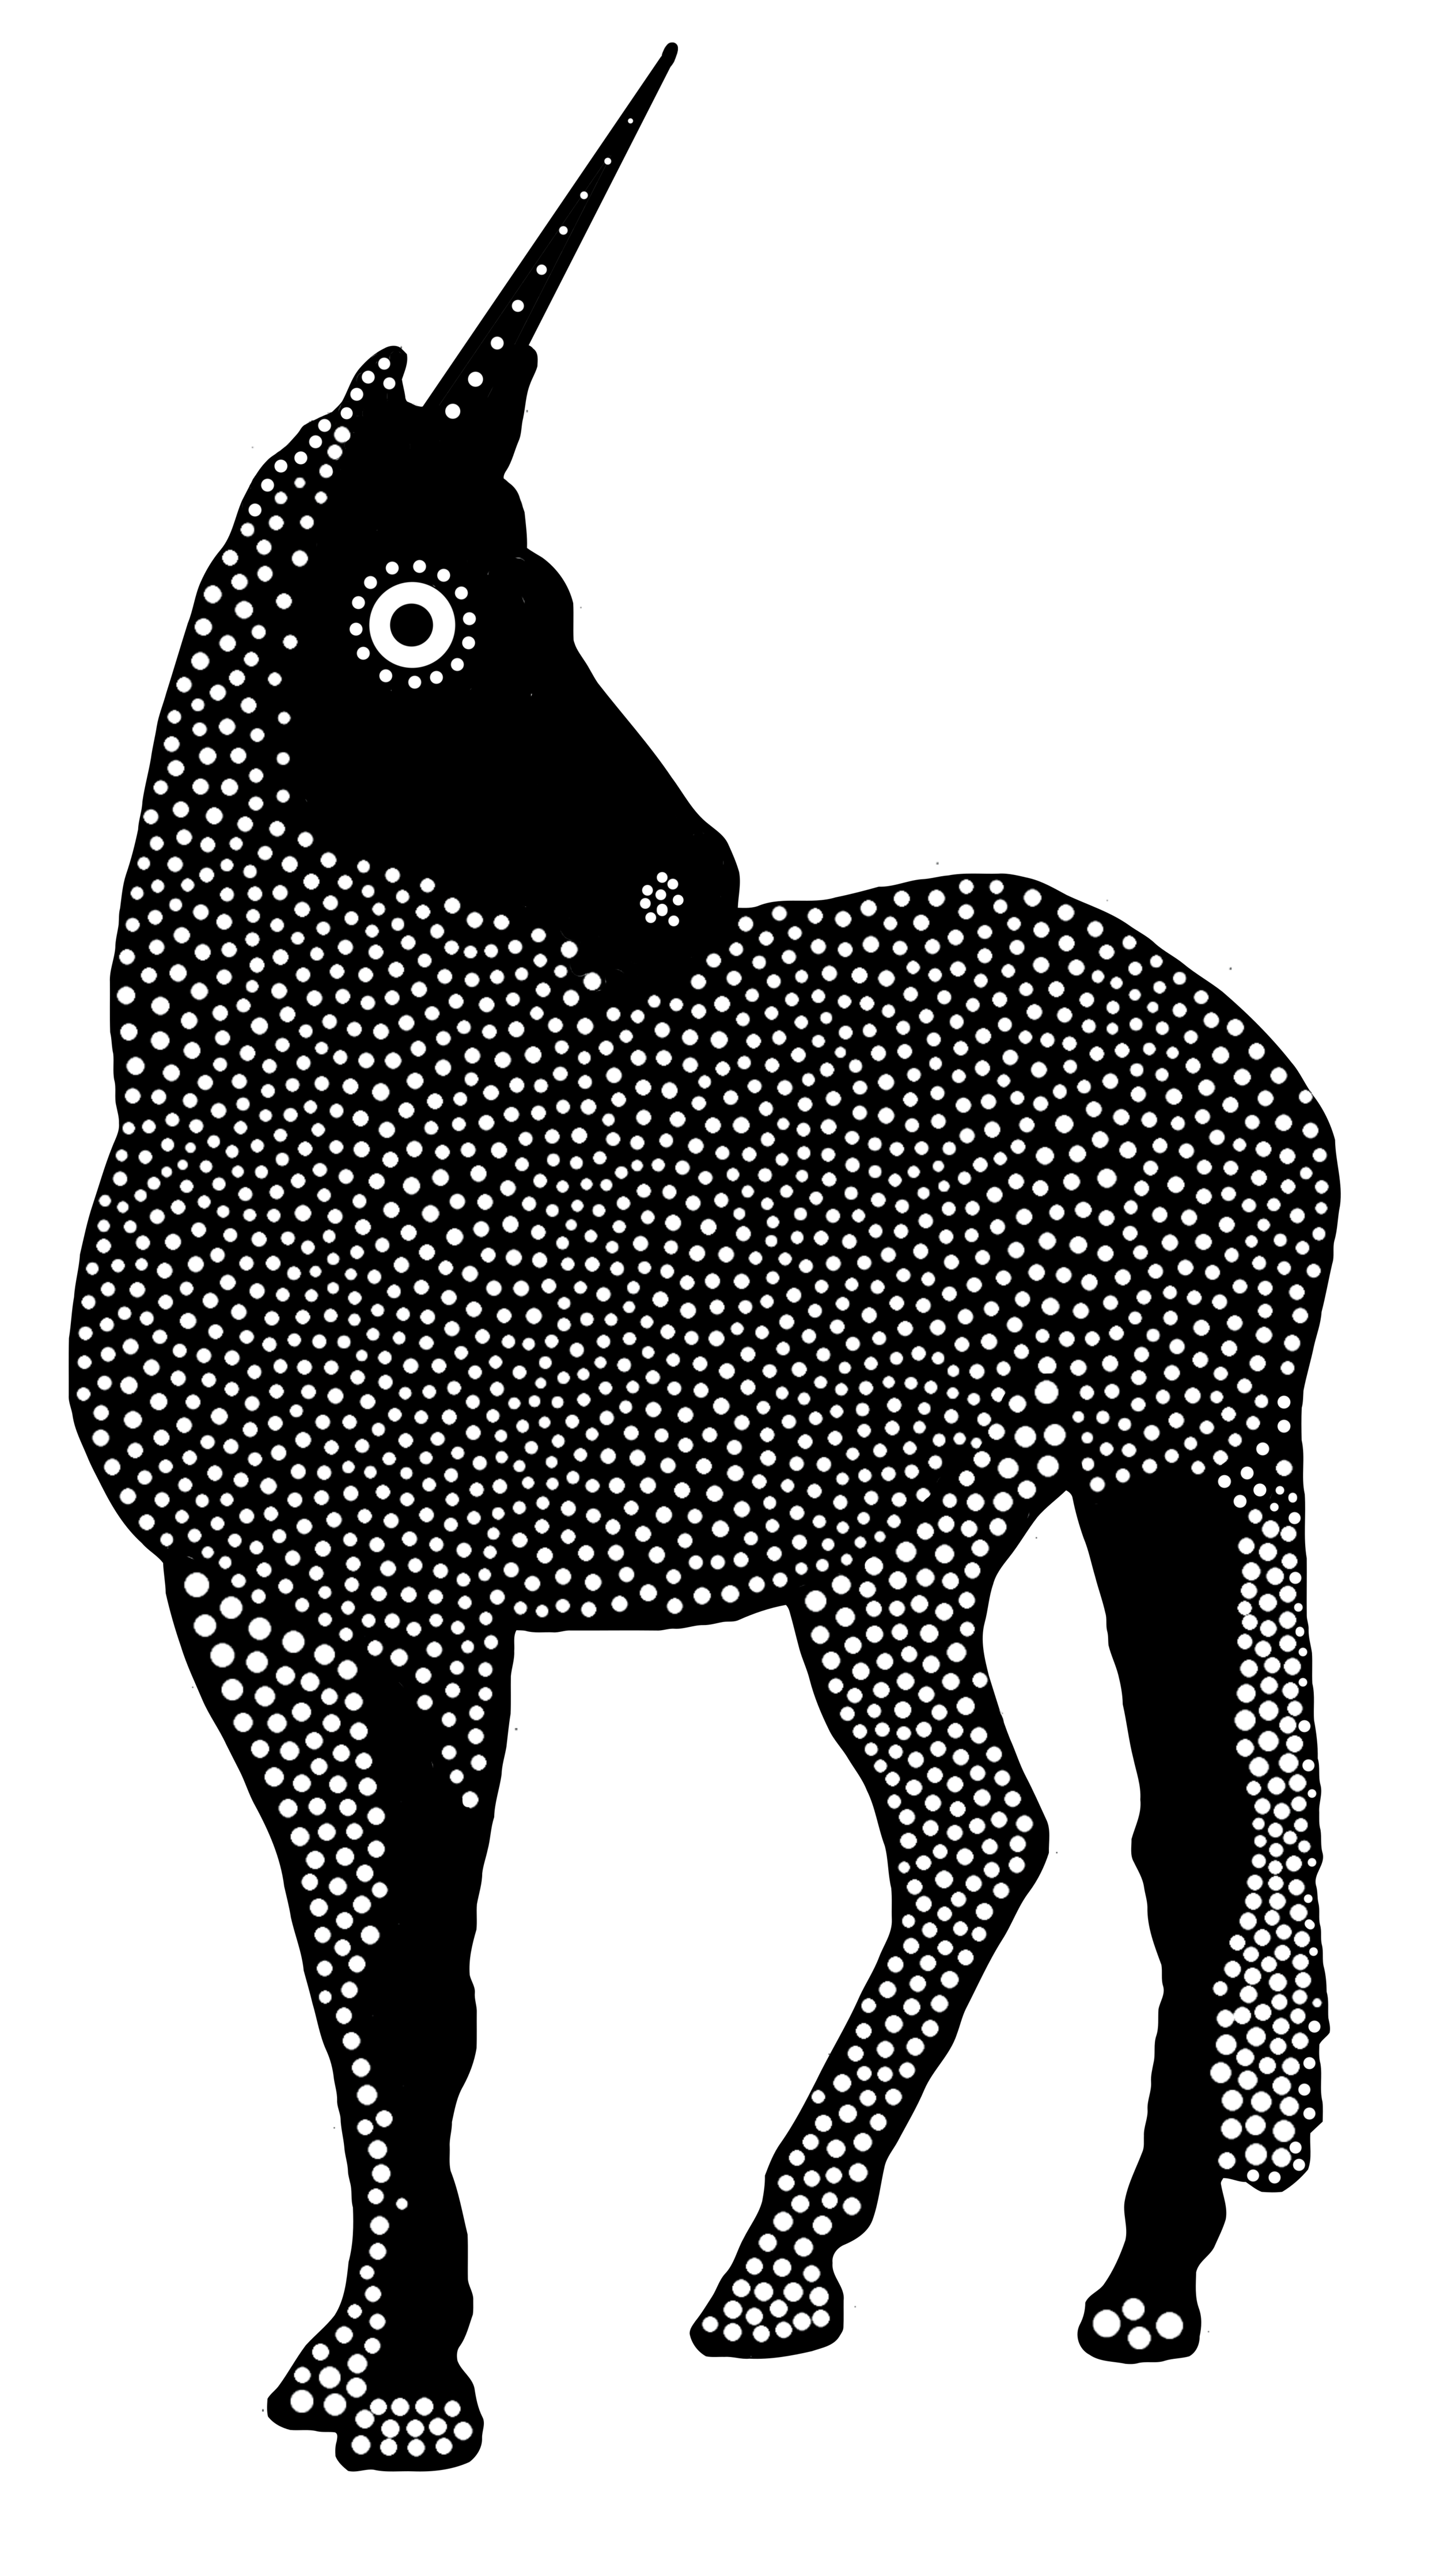 unicorn-1.png